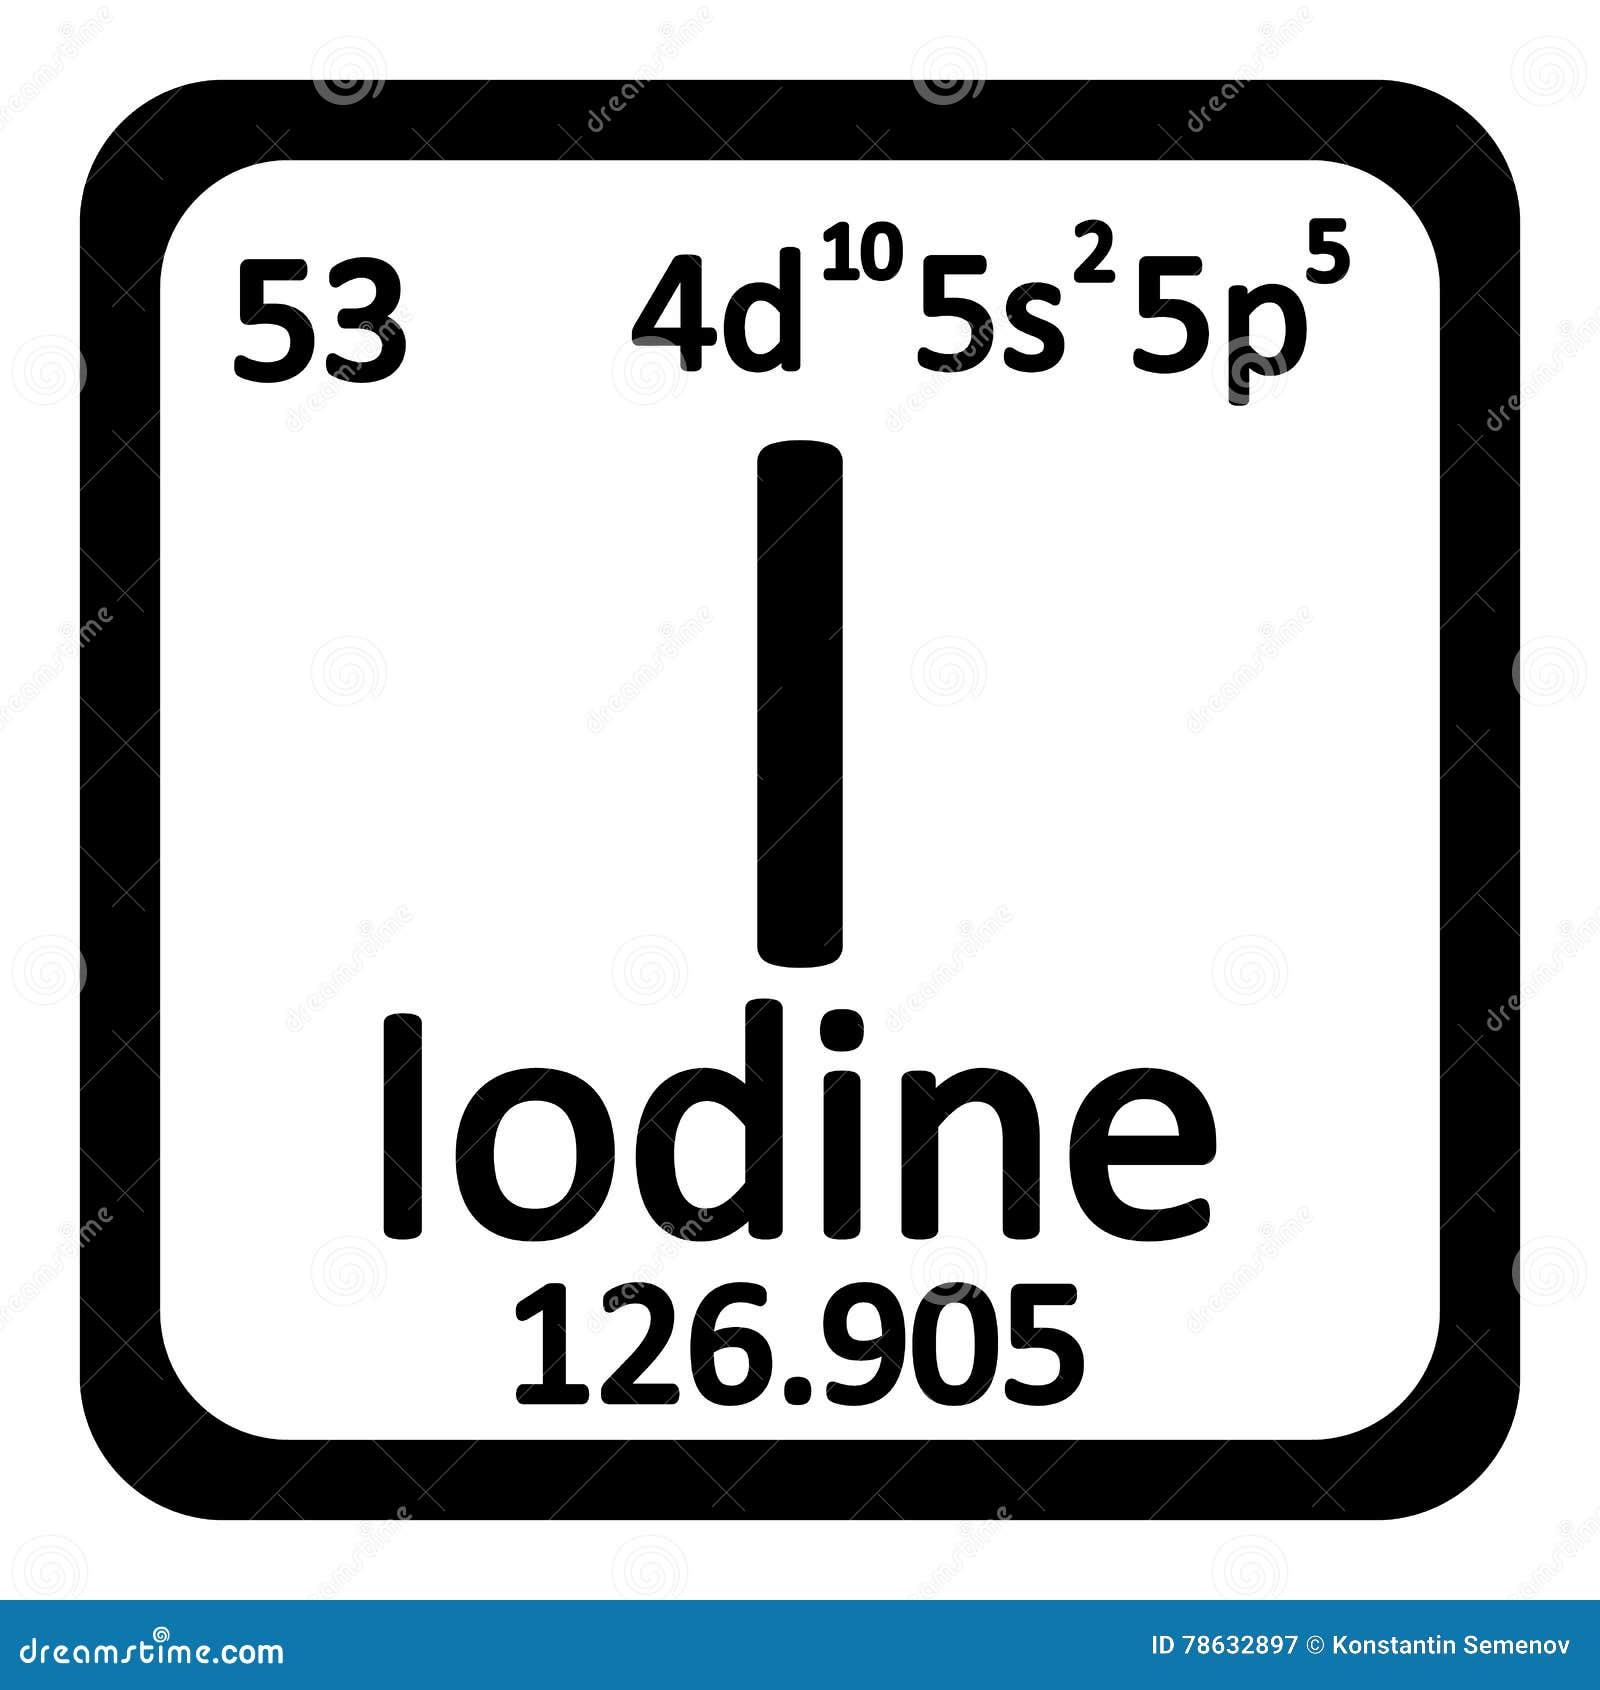 Periodic table element iodine icon stock illustration image periodic table element iodine icon gamestrikefo Gallery